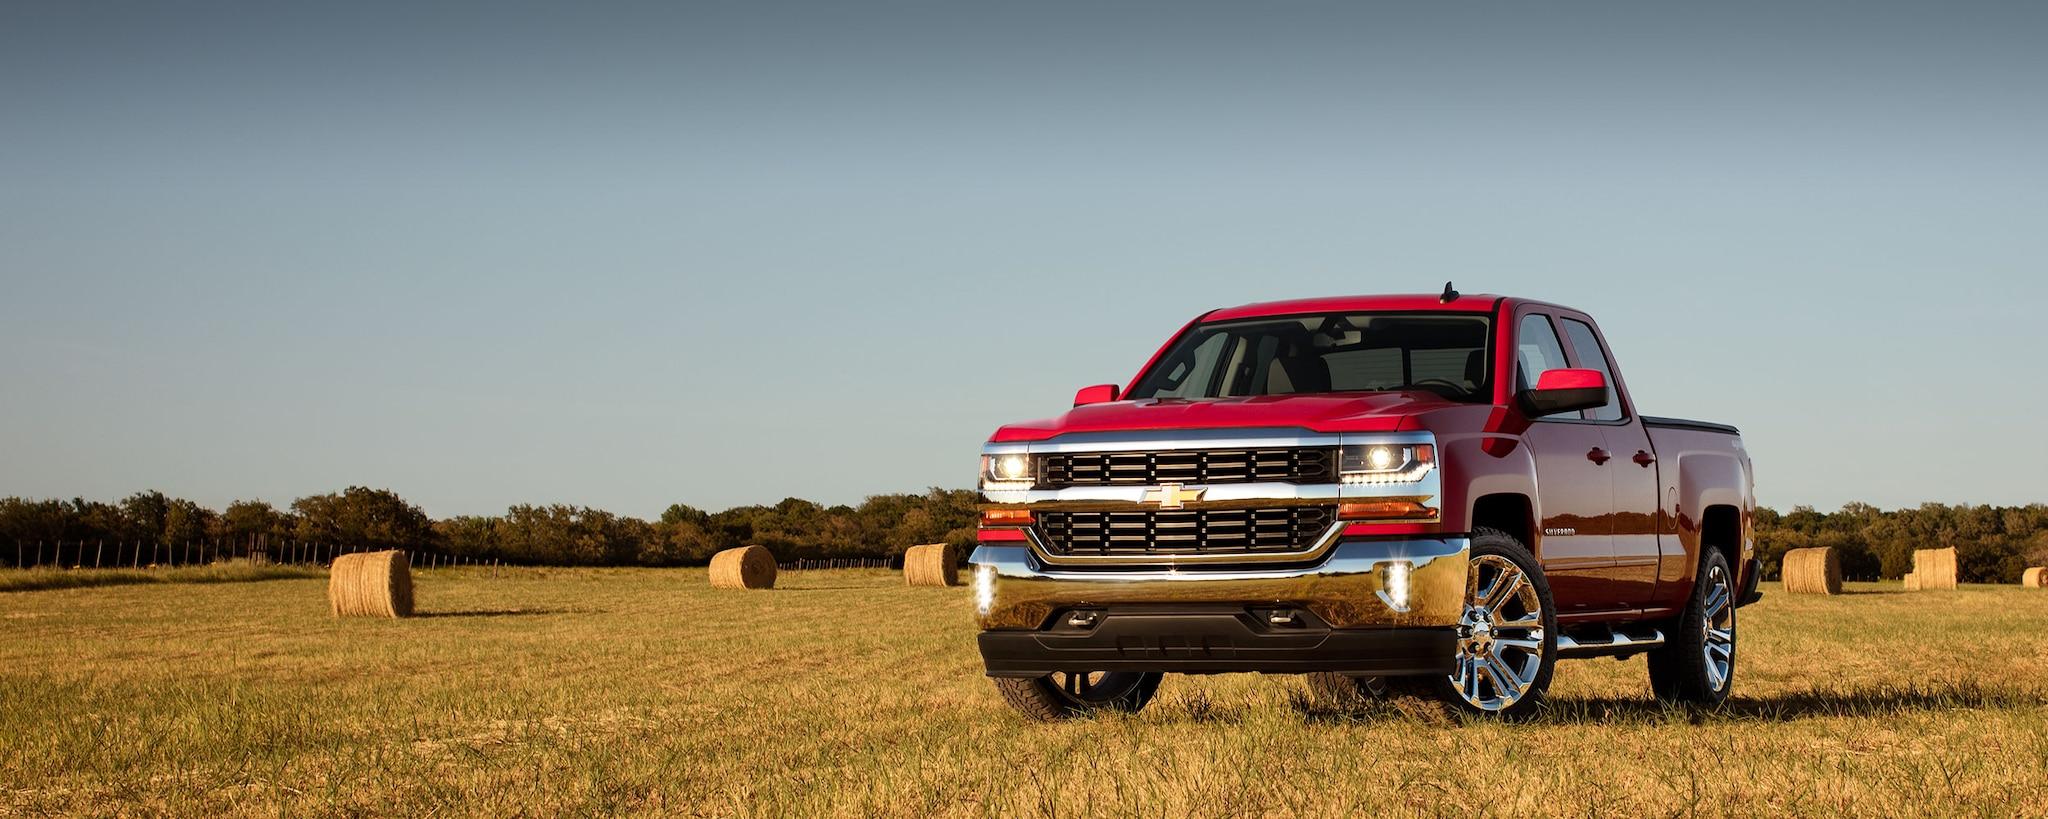 Silverado 1500 2018: Camioneta pickup | Chevrolet